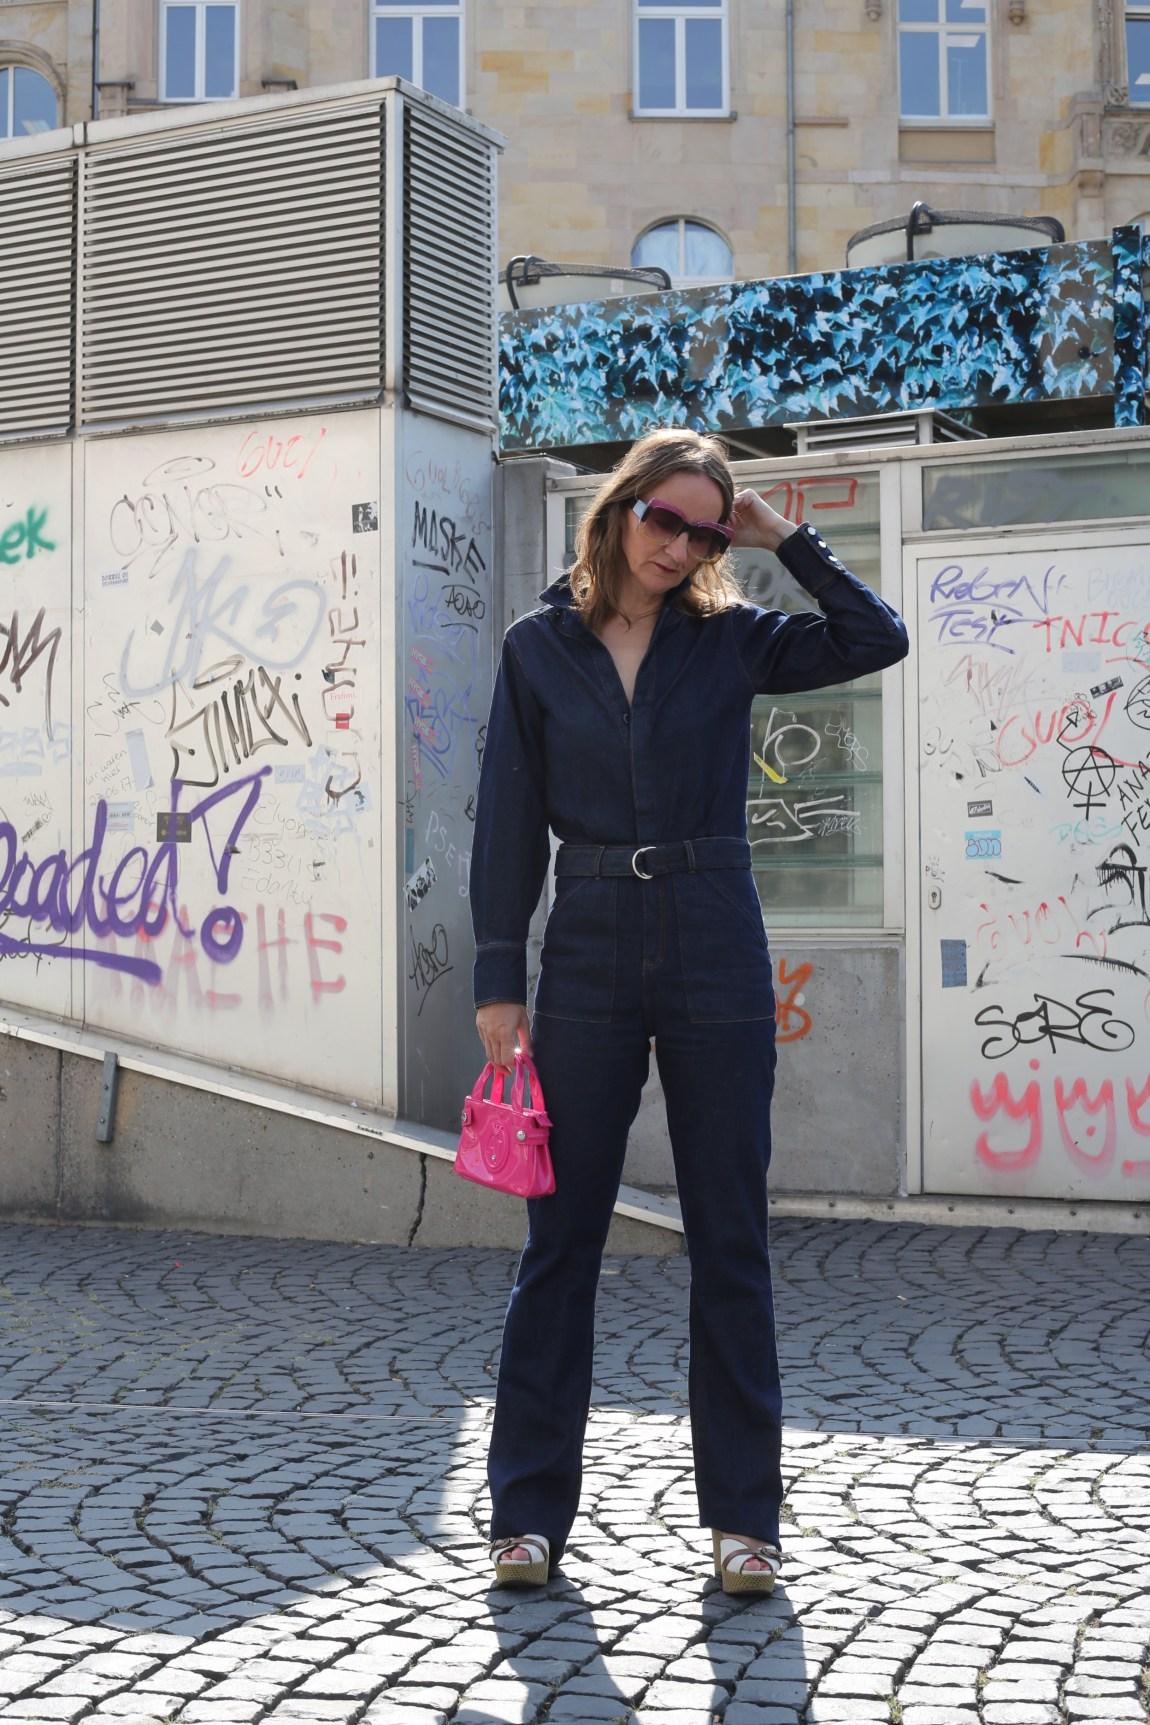 denim-jumpsuit_jeans-overall_mode-blog_ue40_oceanblue-style_frankfurt_armani_boho-tasche_bash-paris_hilfiger-sandalen (8)